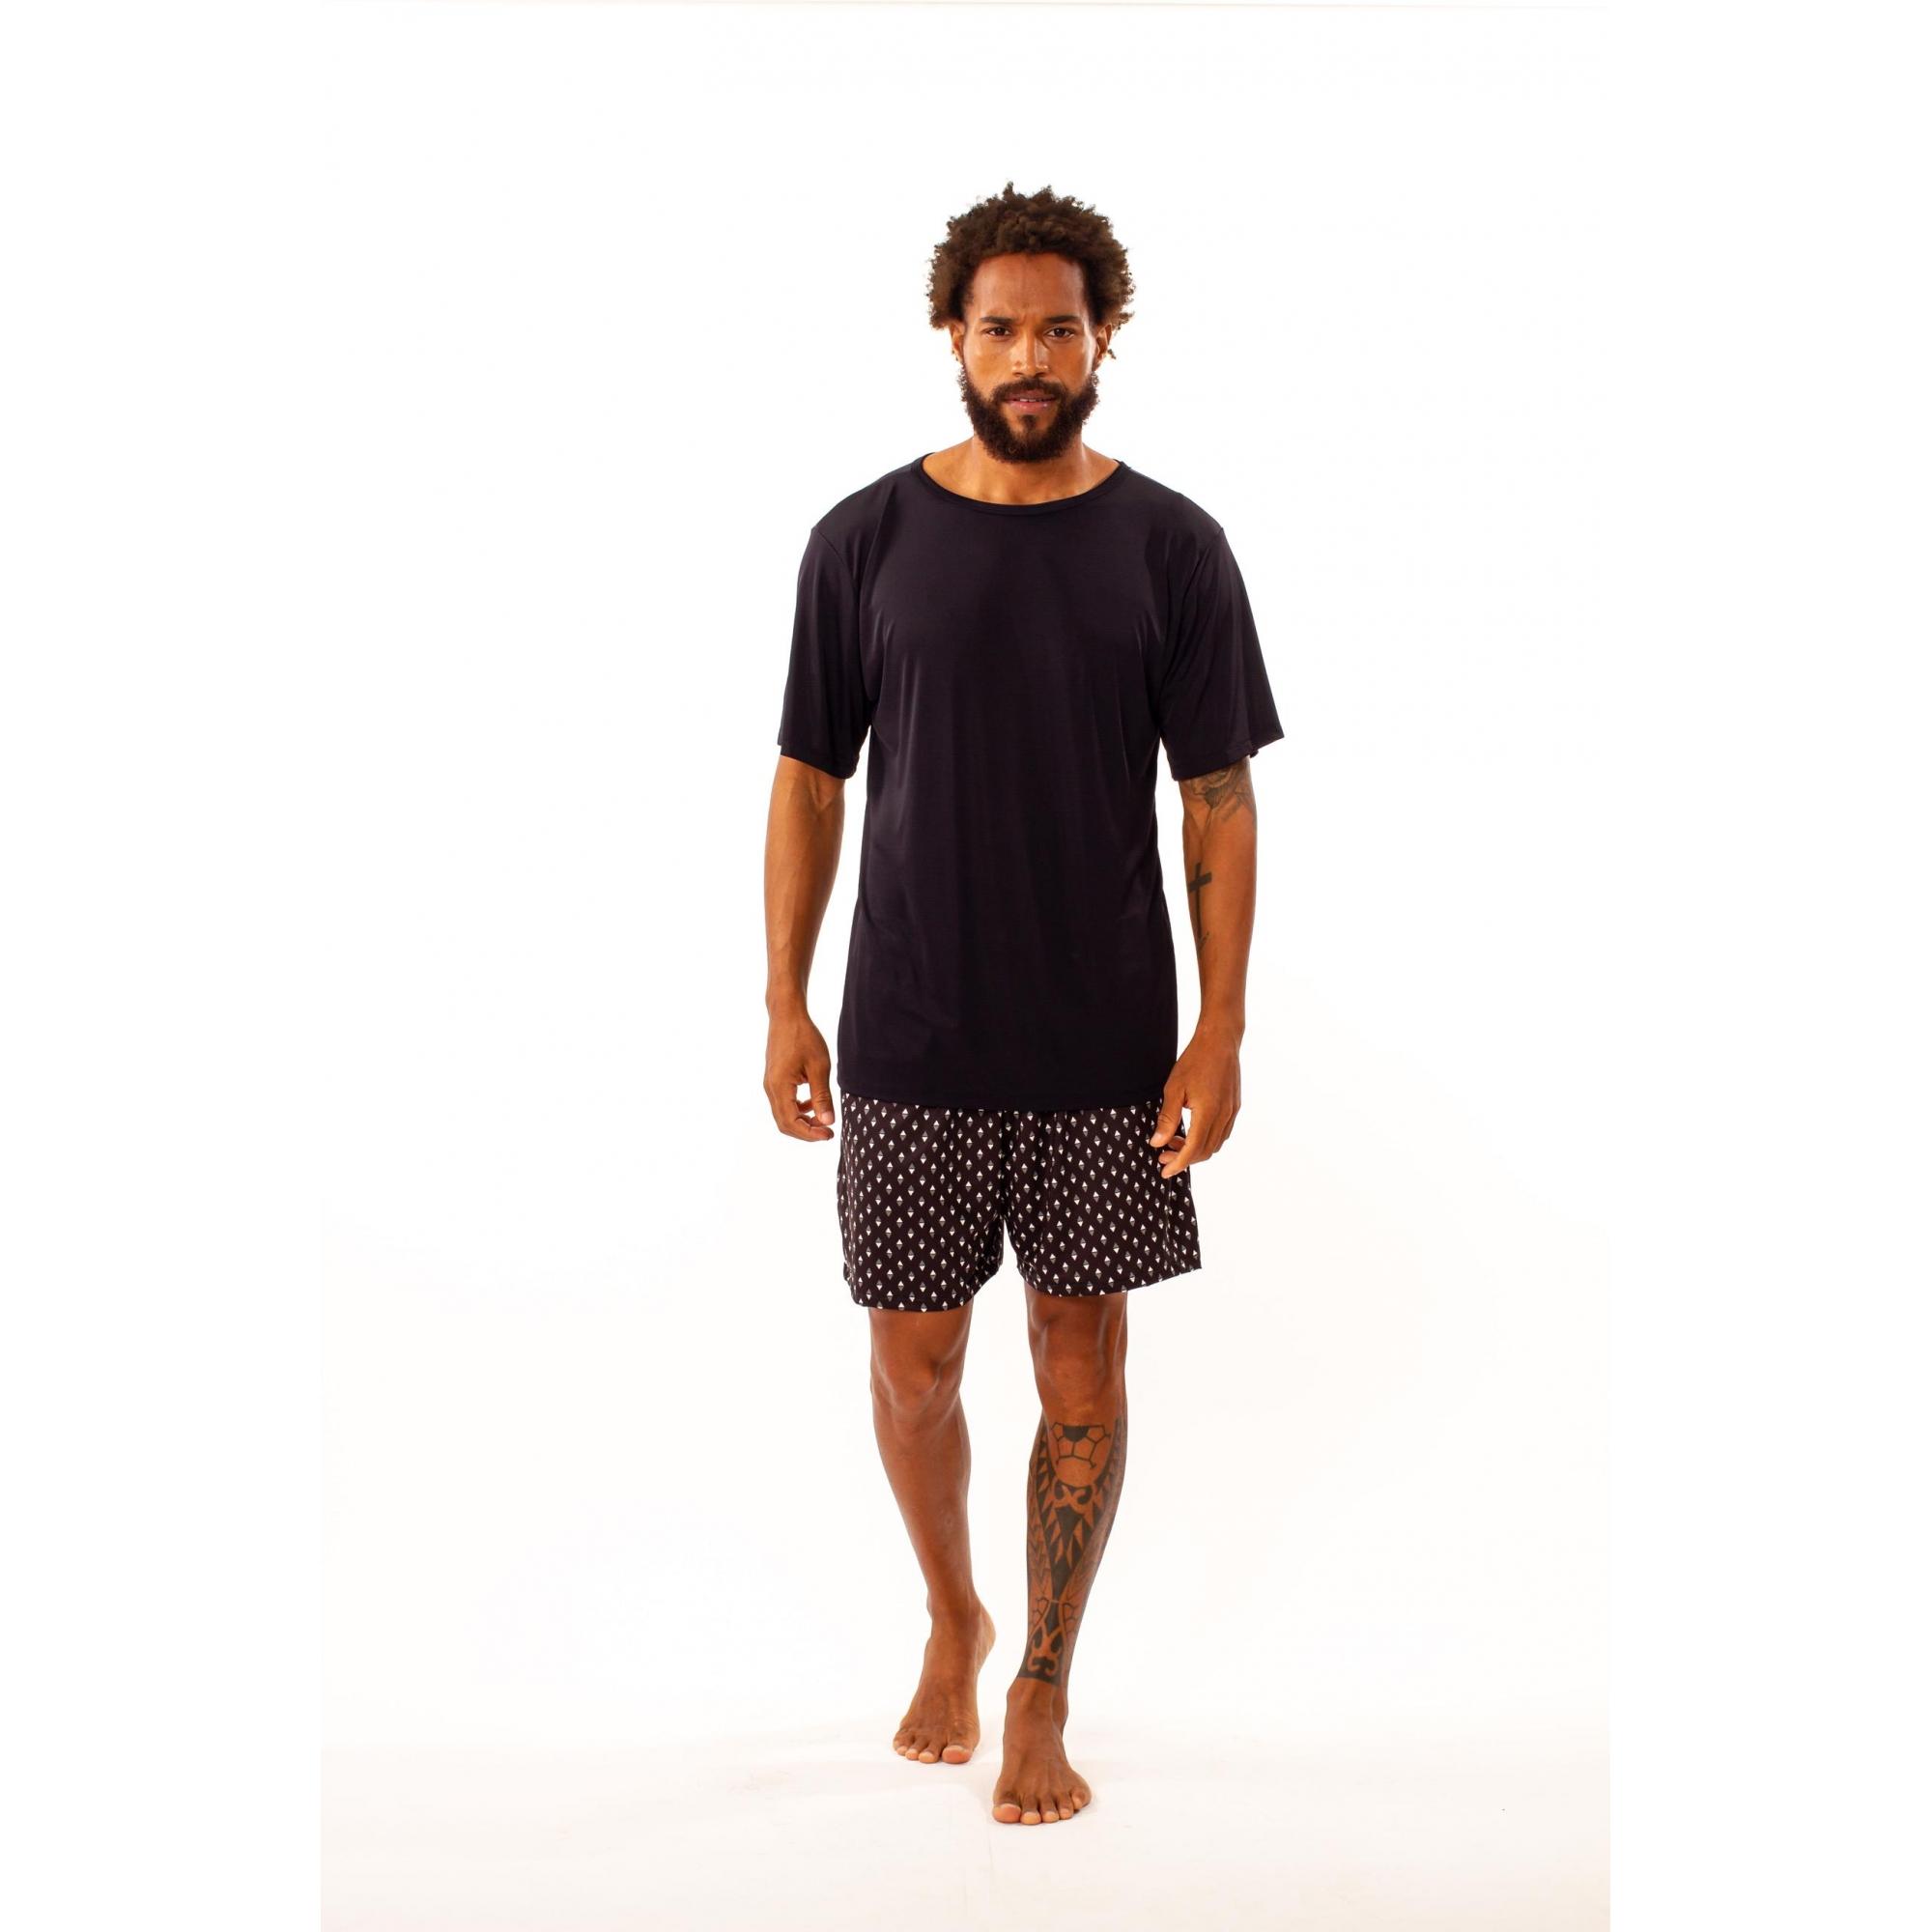 Pijama curto masculino em liganete - 78